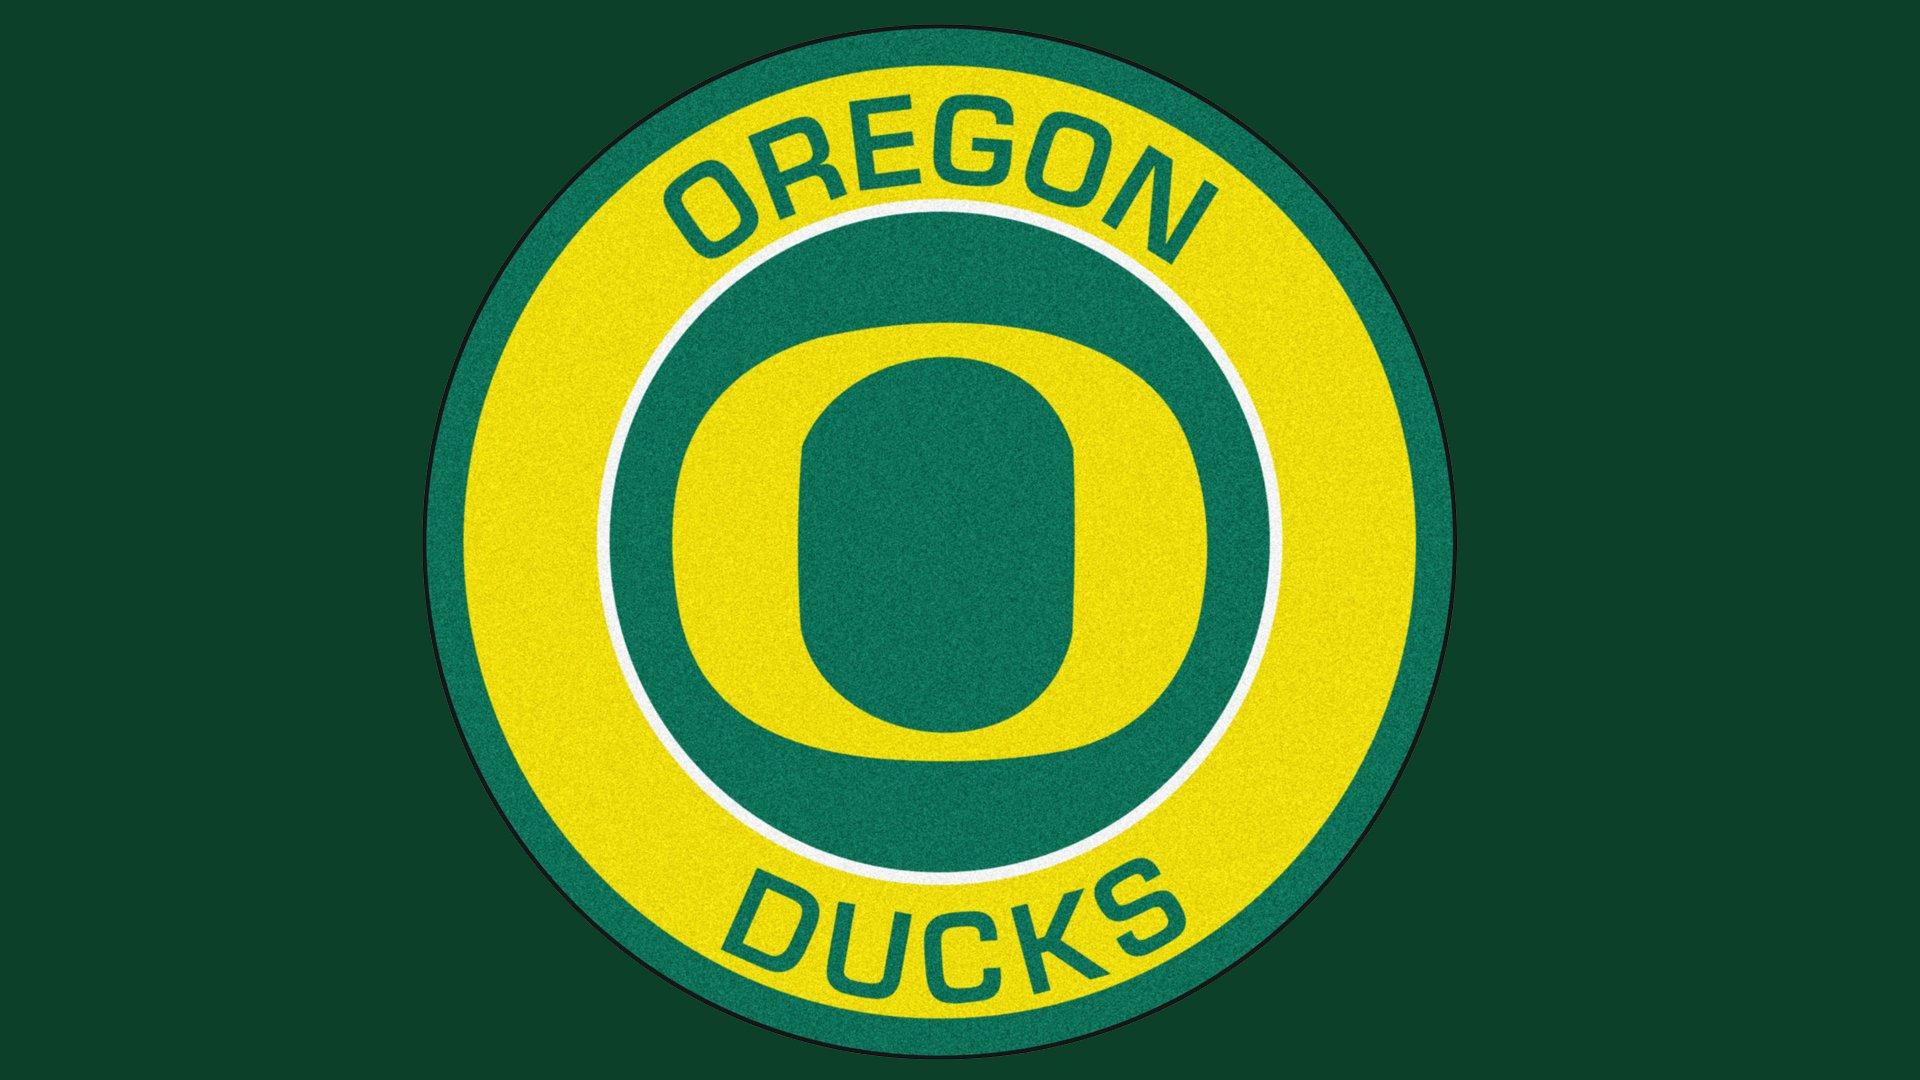 Oregon Ducks Logo, Oregon Ducks Symbol, Meaning, History and Evolution